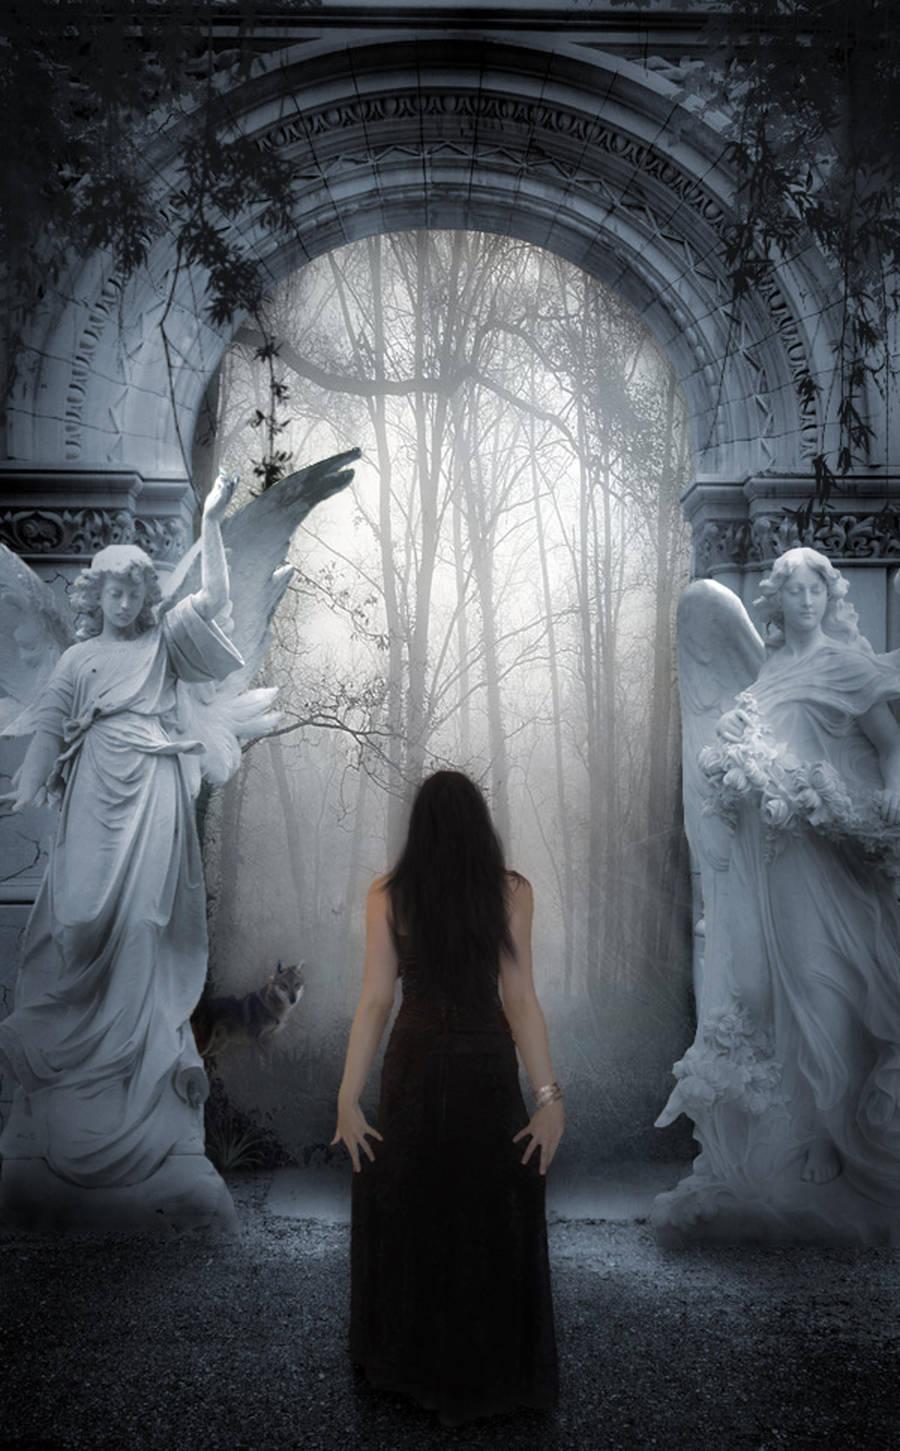 Enter My Realm by Senelfy